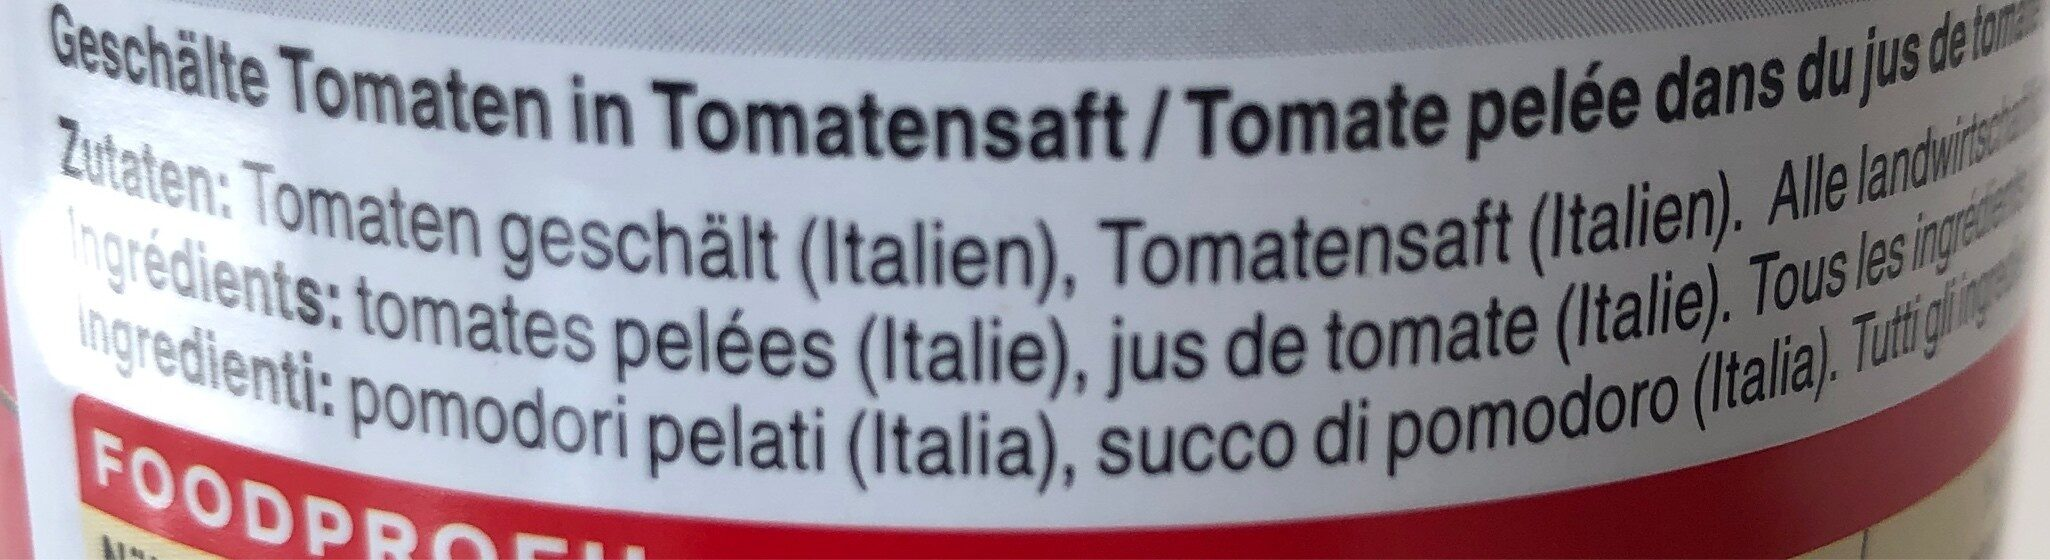 Pomodori Pelati - Ingredients - fr